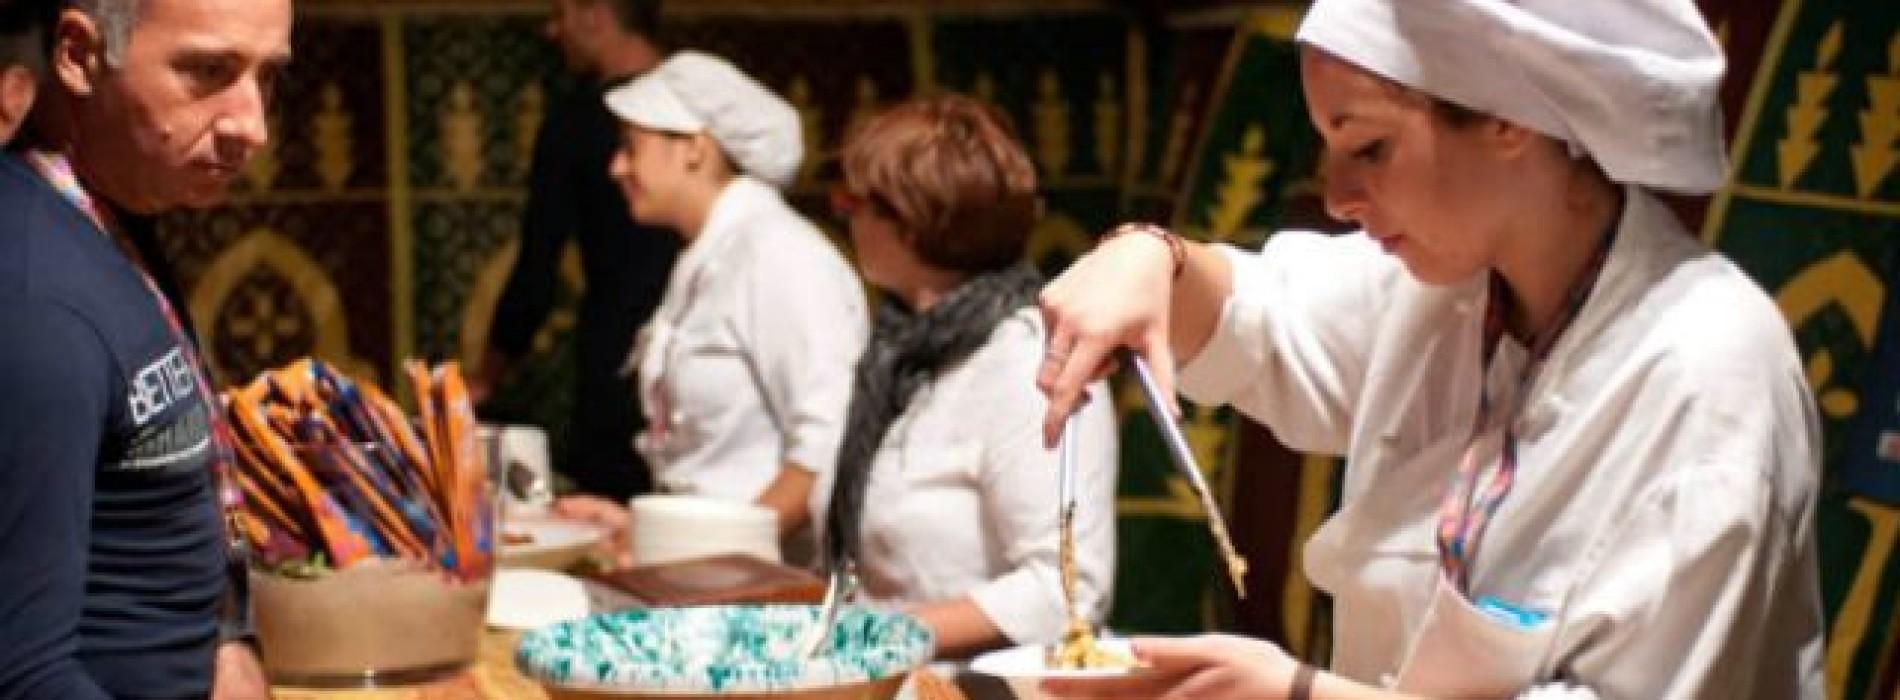 Cous cous fest 2014 a san vito lo capo - San vito a tavola ...